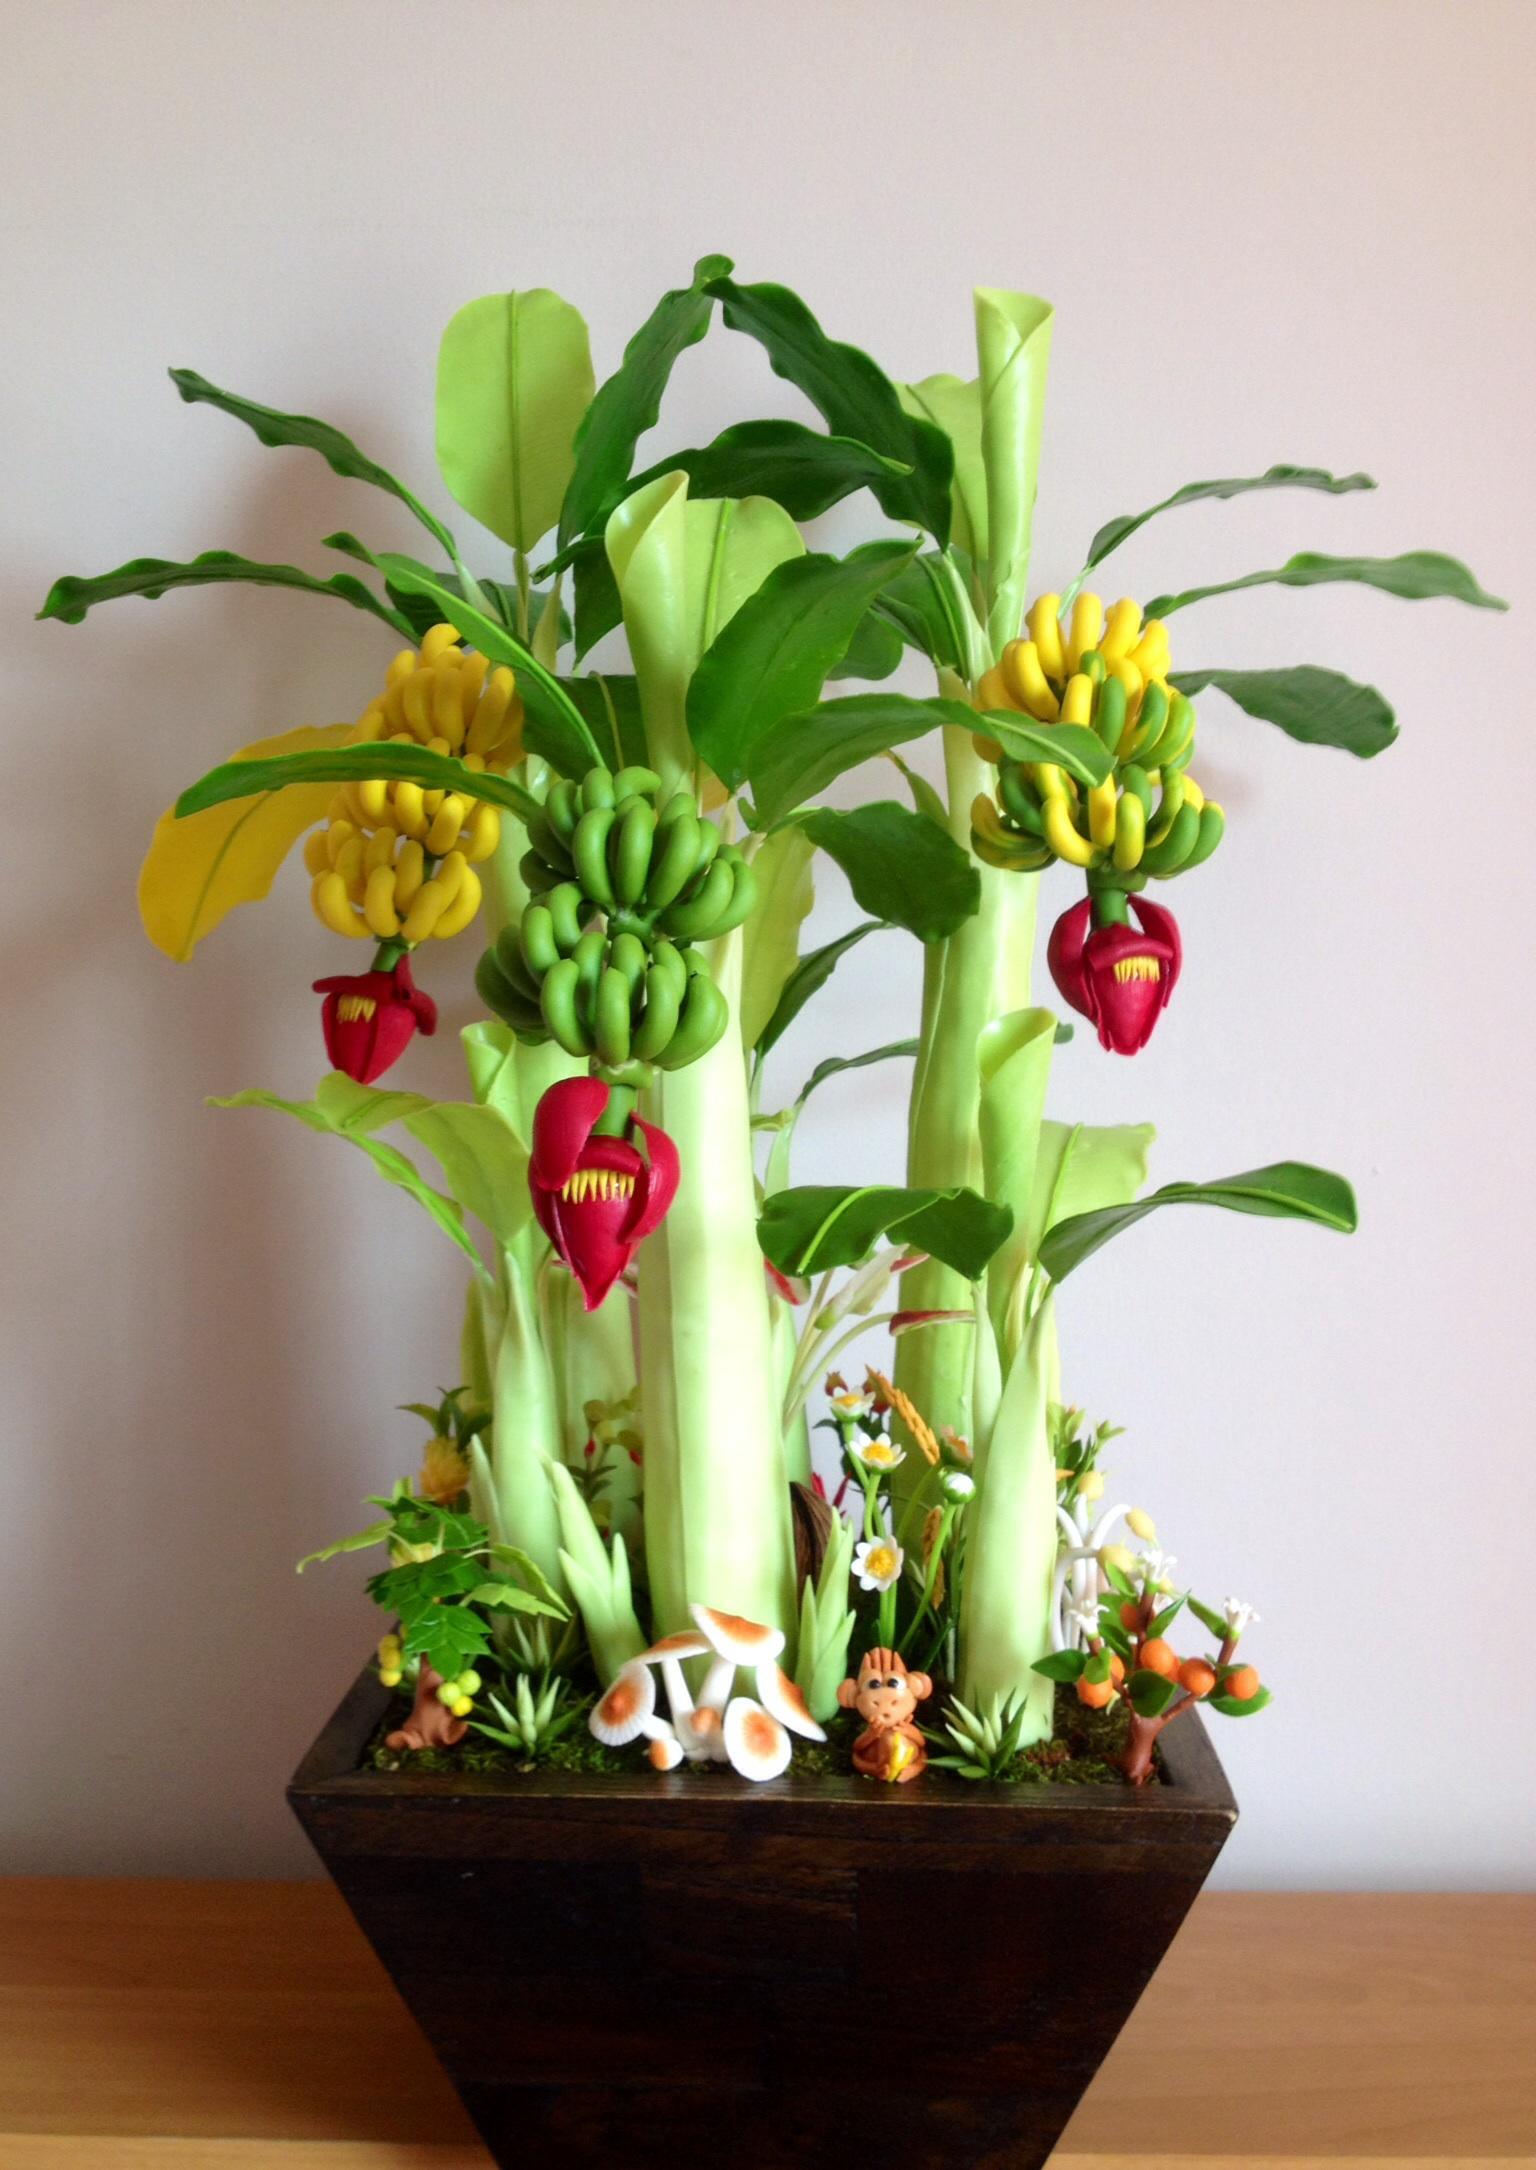 B018-ต้นกล้วยหอมไซร์ใหญ่